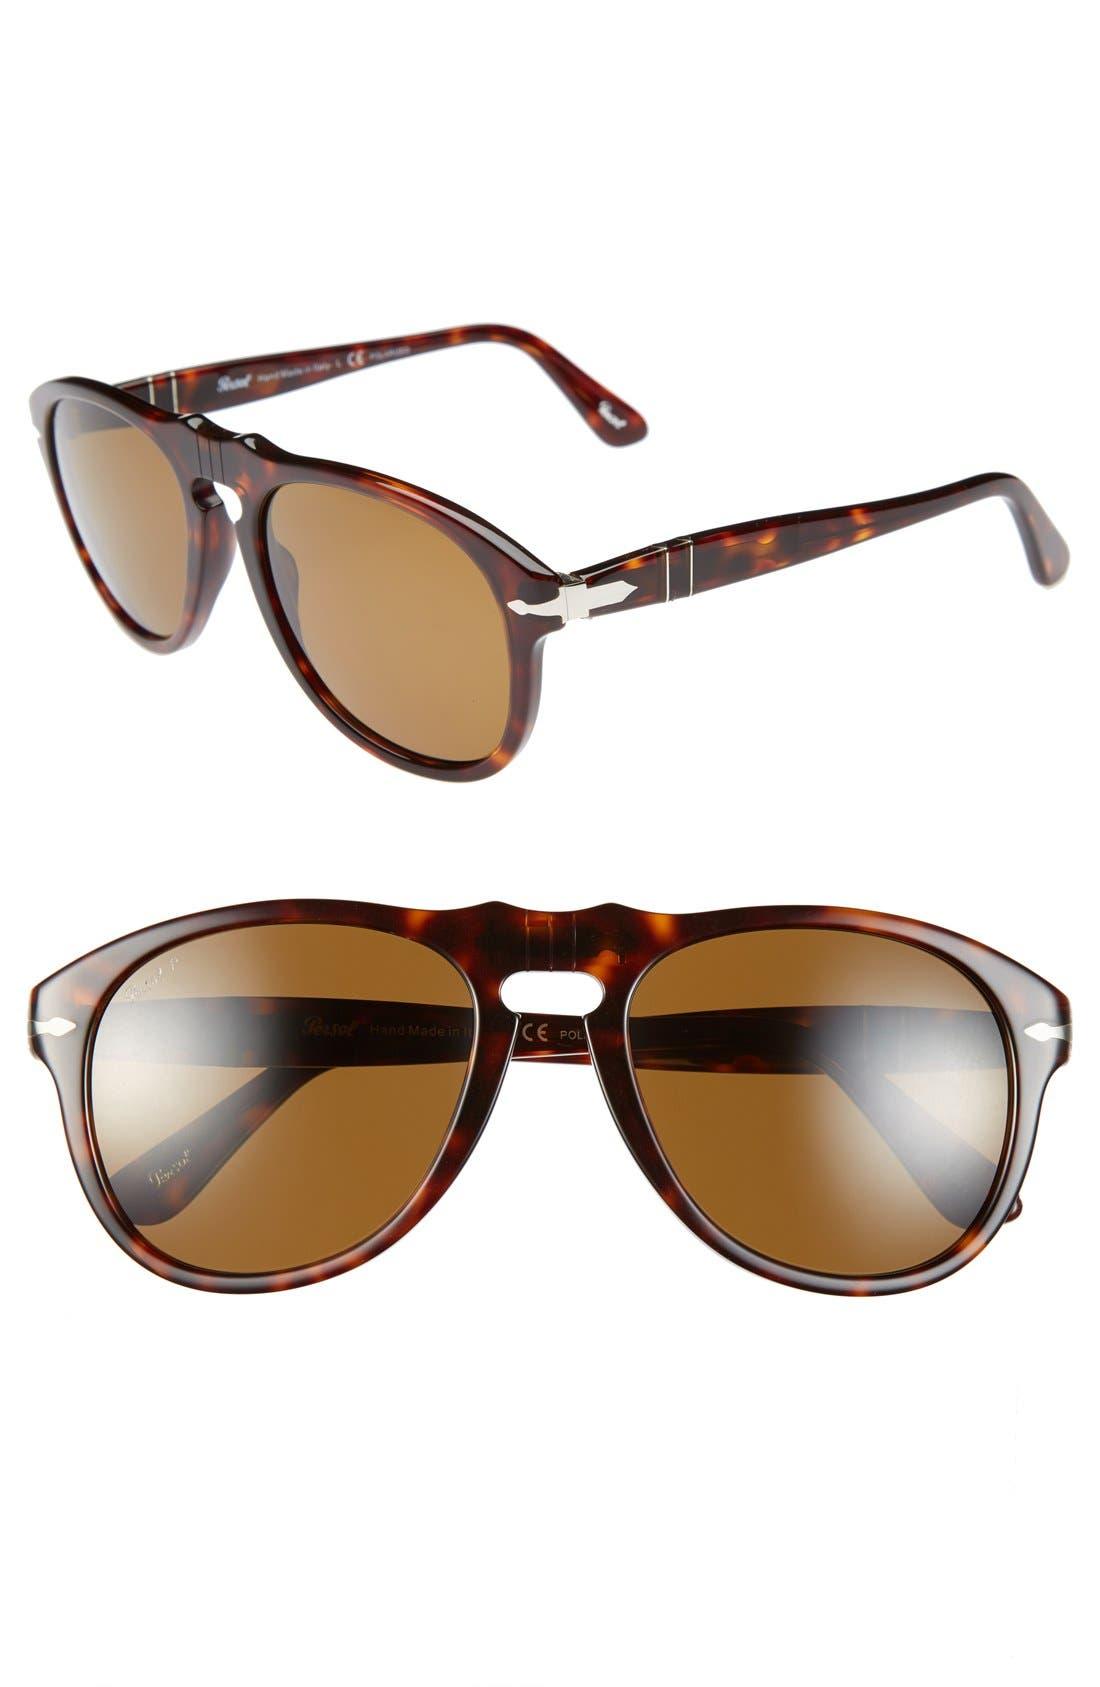 Main Image - Persol 54mm Polarized Keyhole Retro Sunglasses